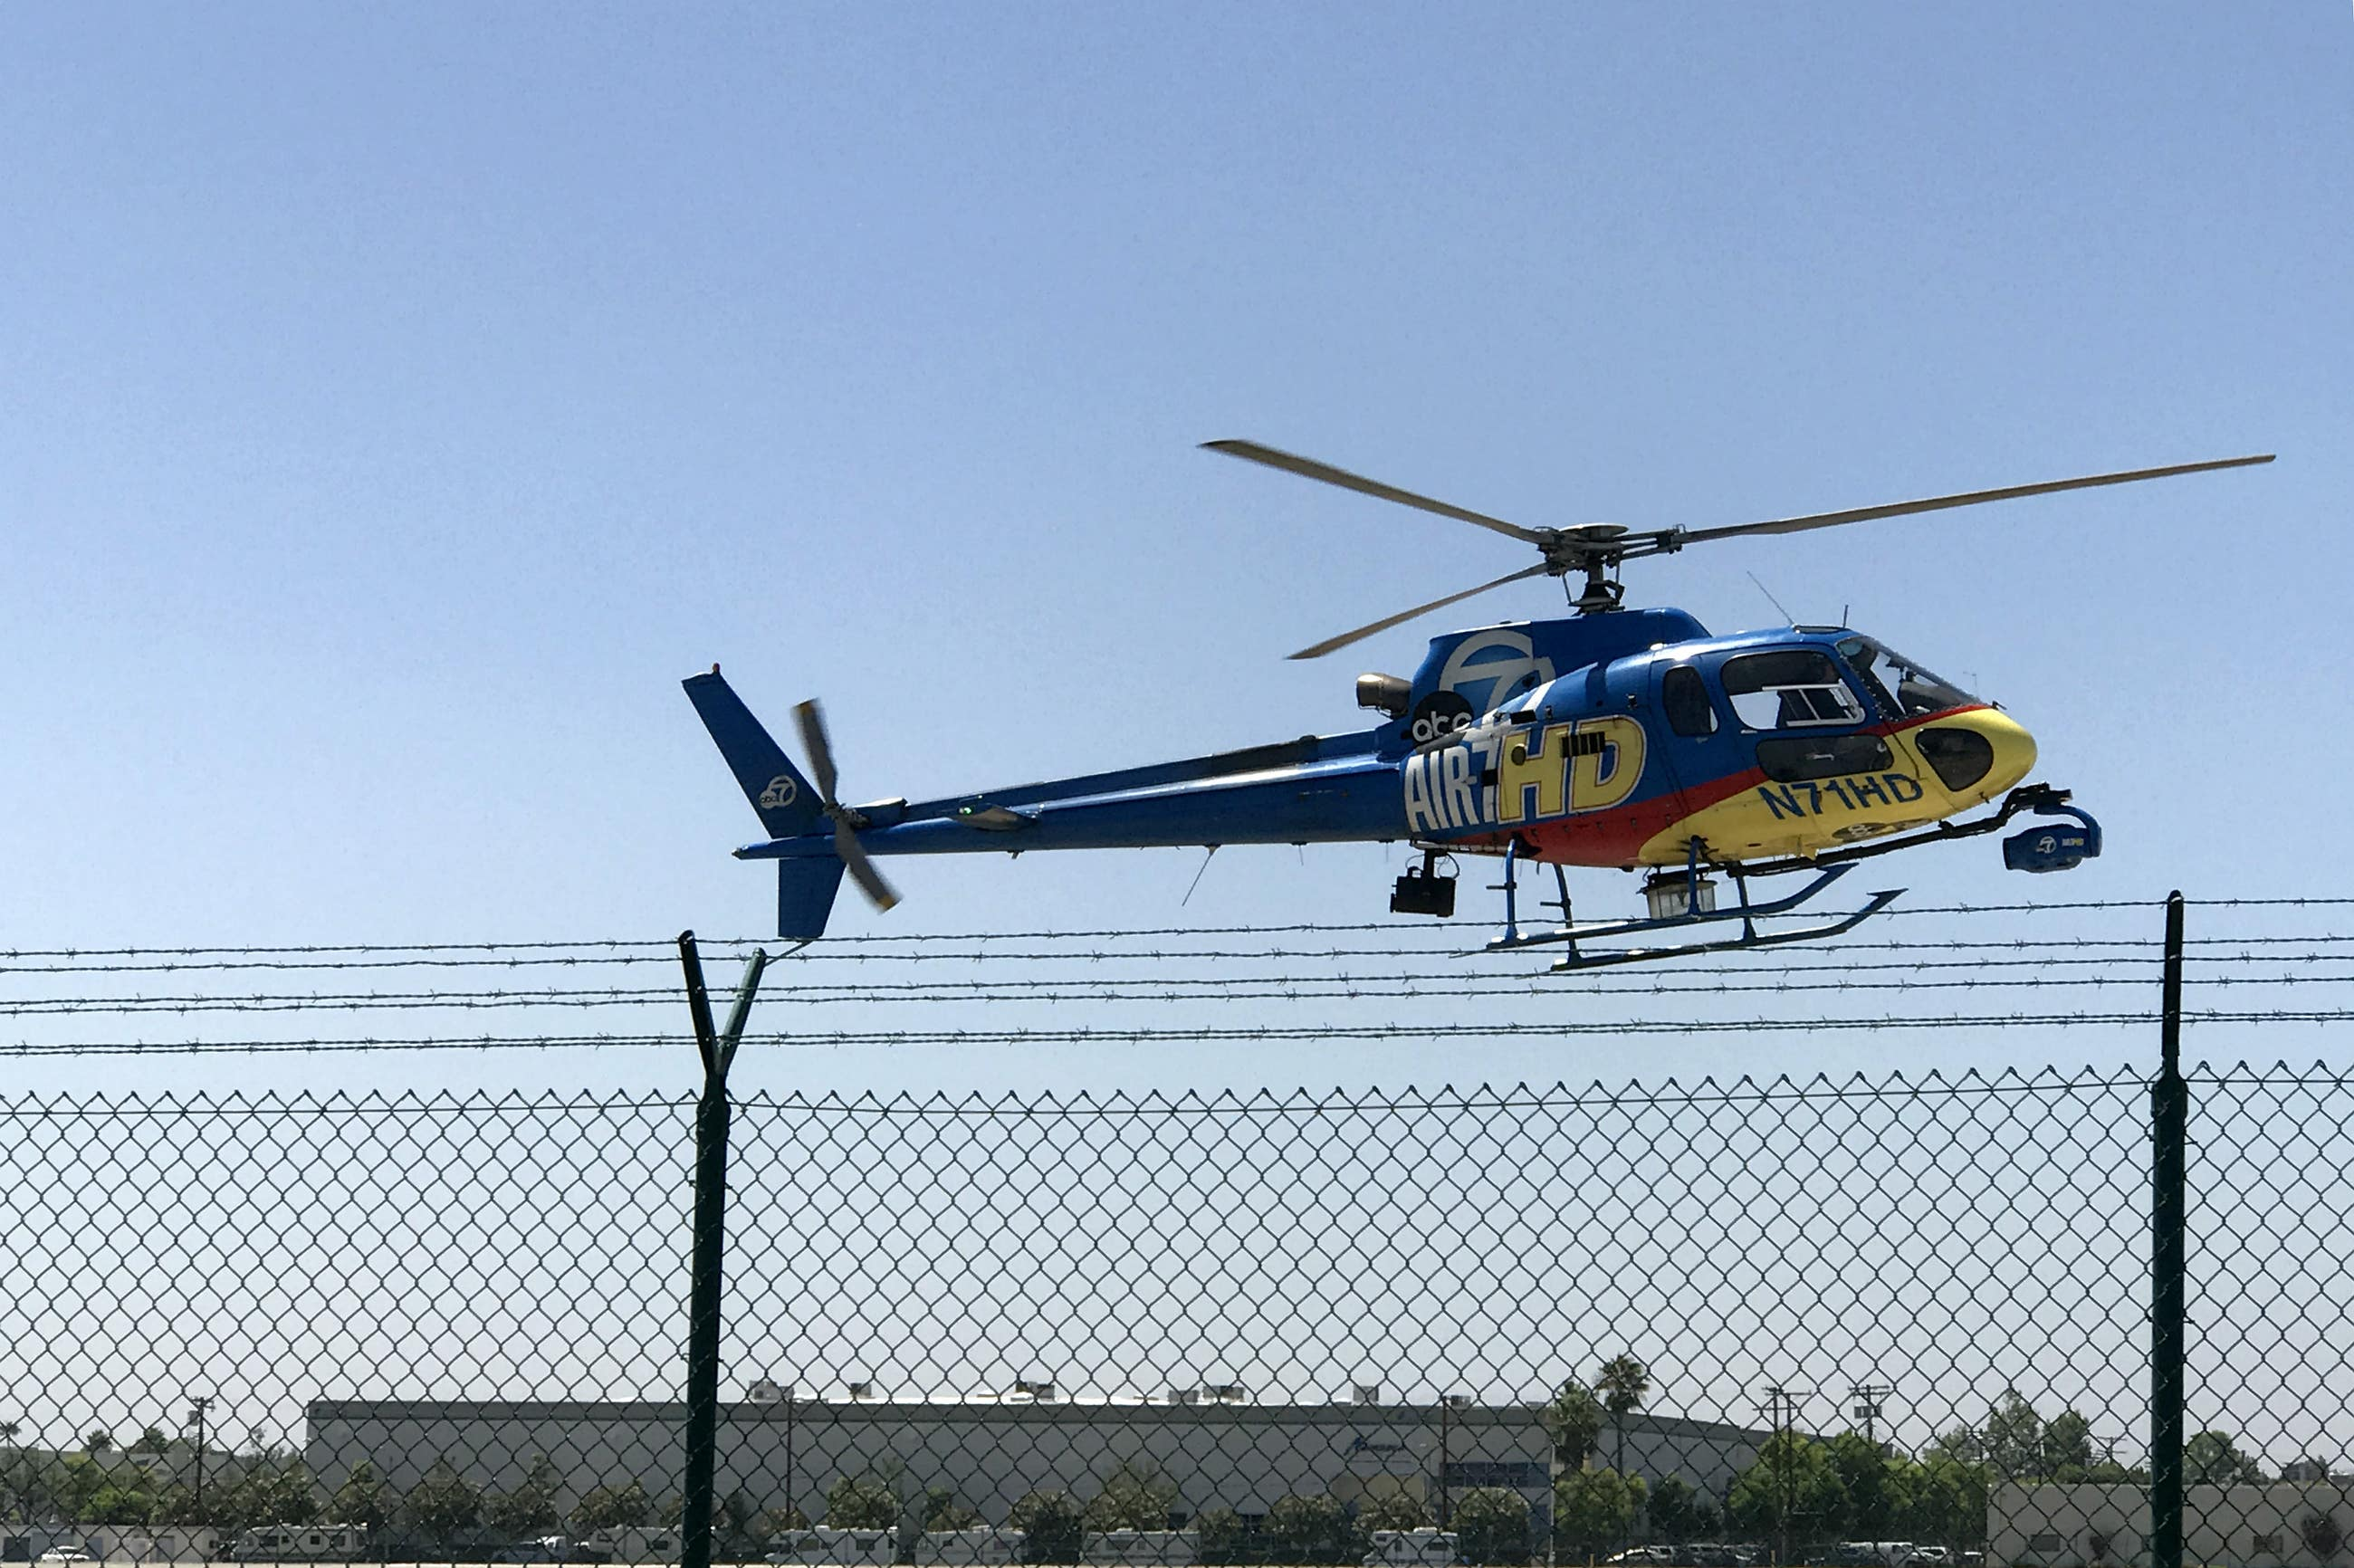 ABC Air 7 news copter landing at Van Nuys Airport